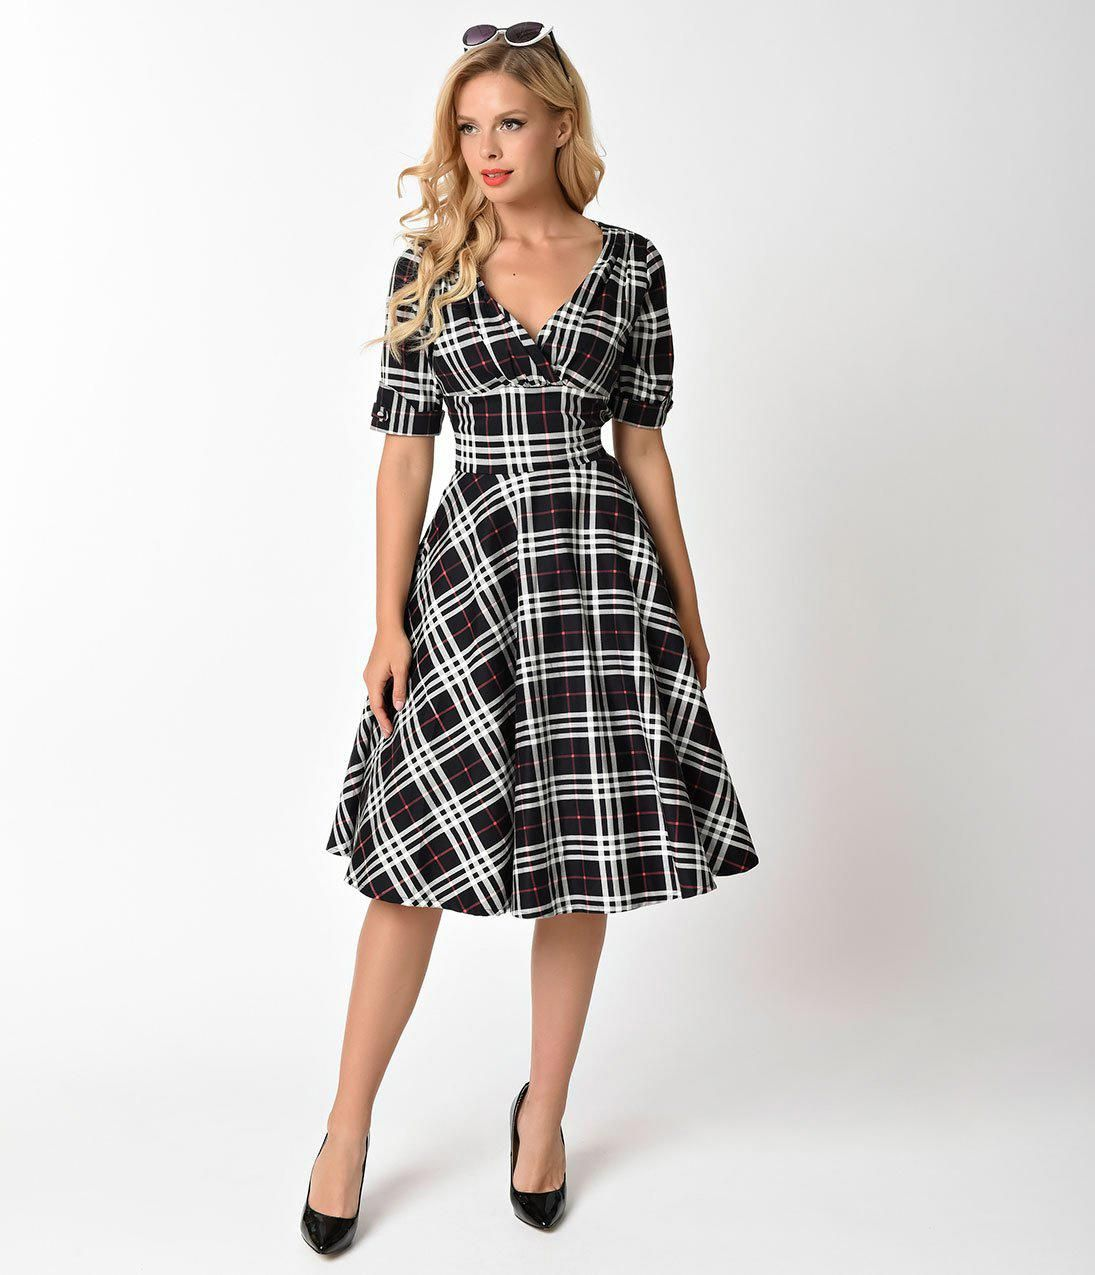 b312799e9 Unique Vintage 1950s Black & White Plaid Delores Swing Dress with Sleeves  #vintage1950sdresses